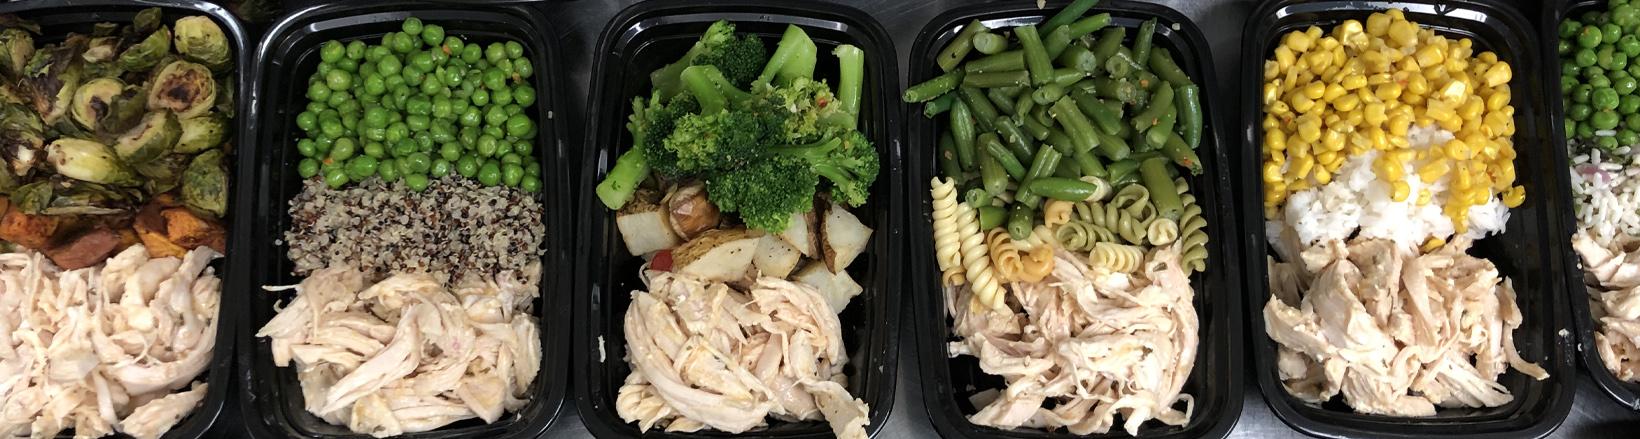 food 4 fuel meals - meal prep rockford il